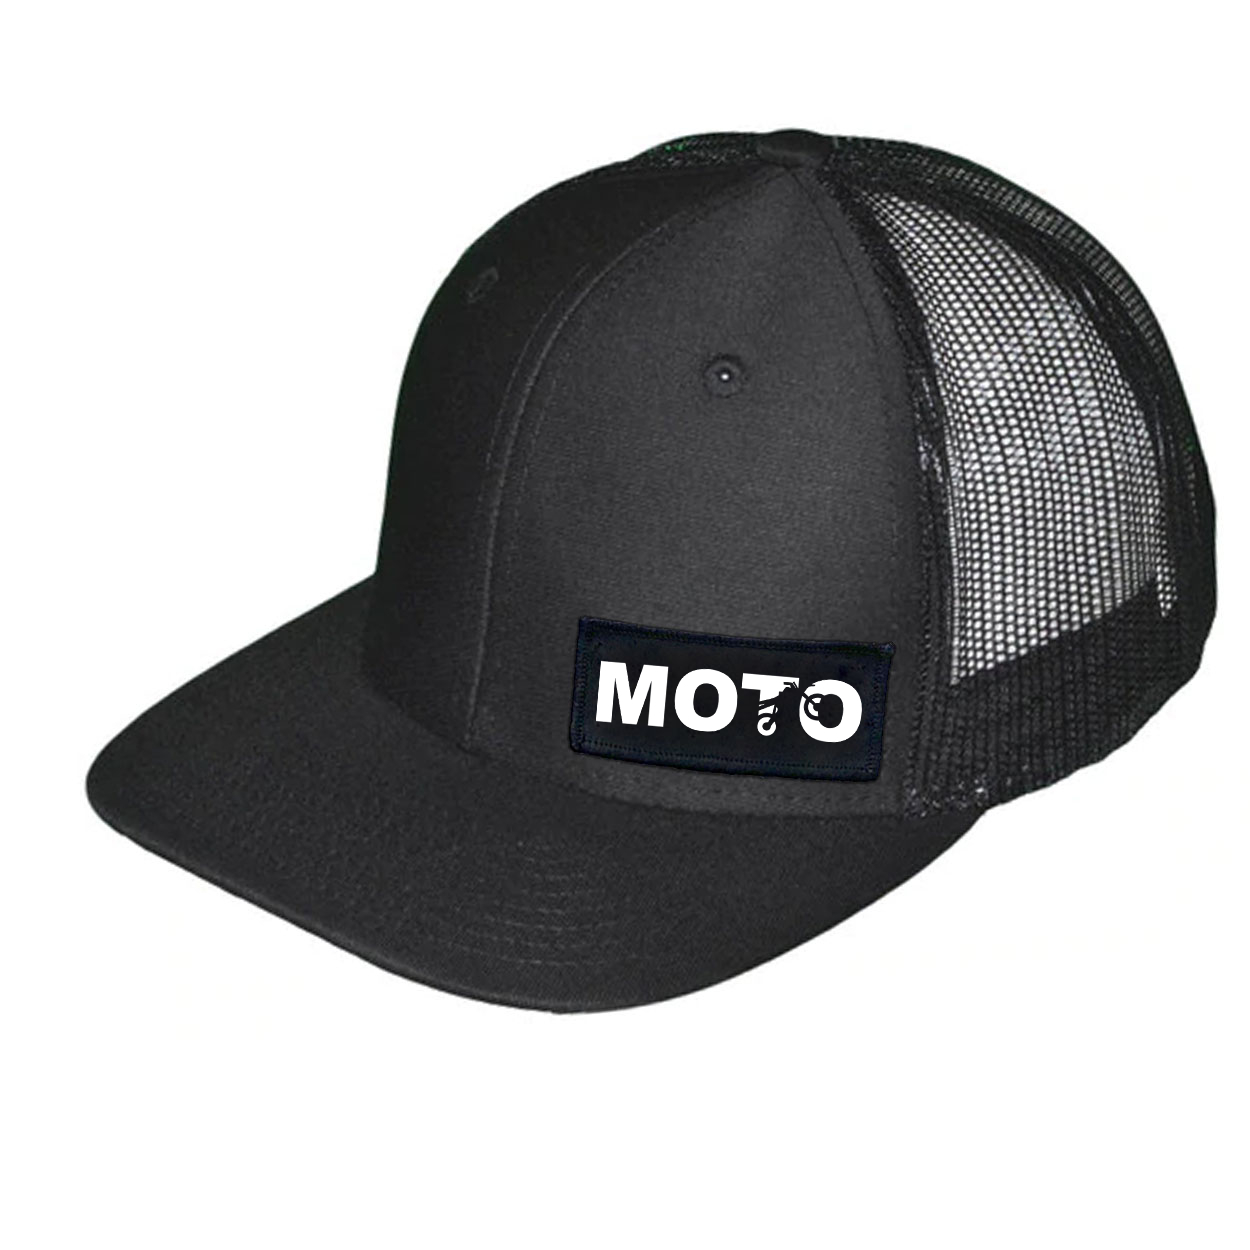 Moto Wheelie Logo Night Out Woven Patch Snapback Trucker Hat Black (White Logo)